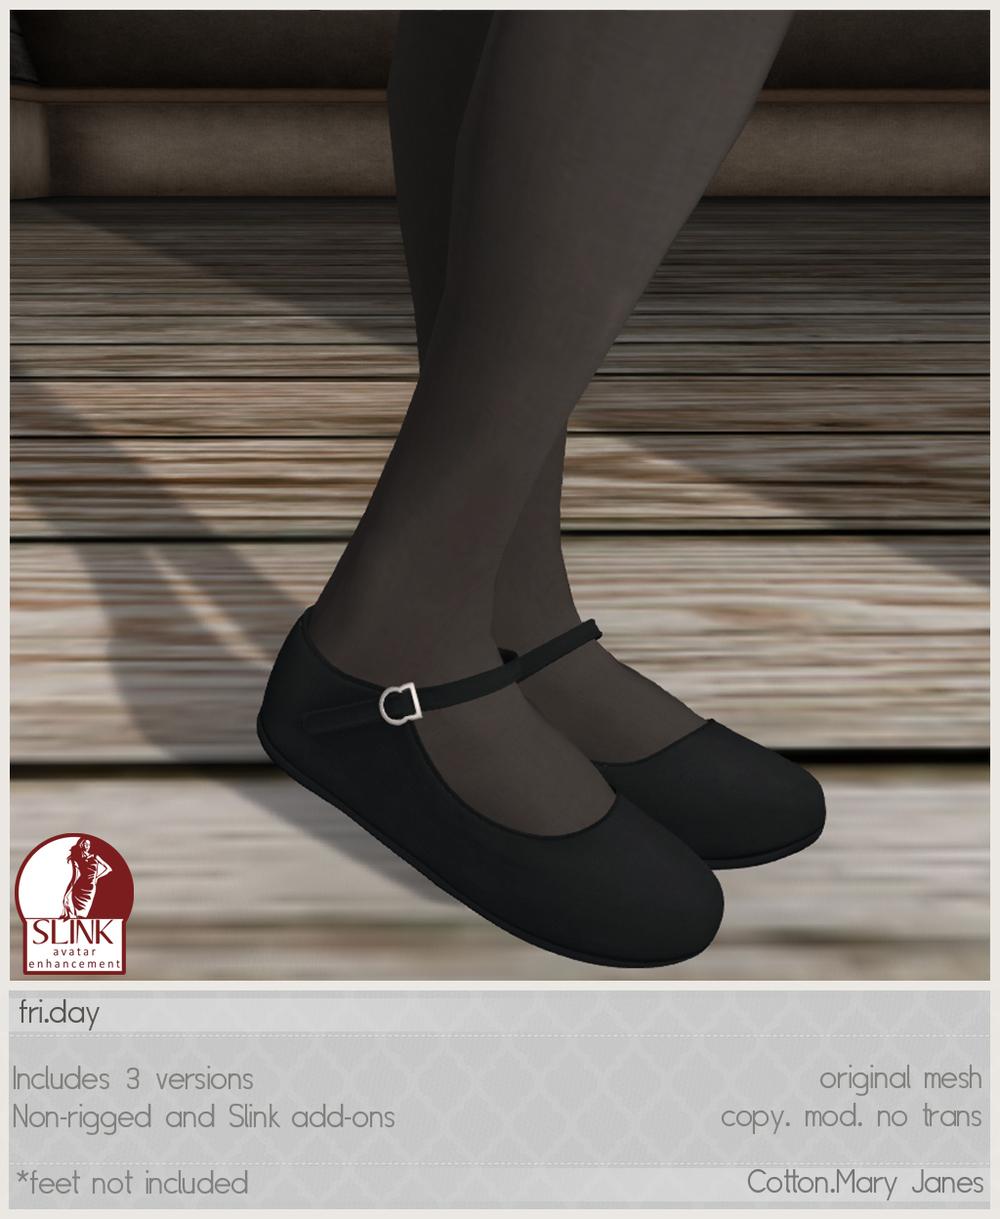 fri - Cotton Mary Janes Ad.jpg